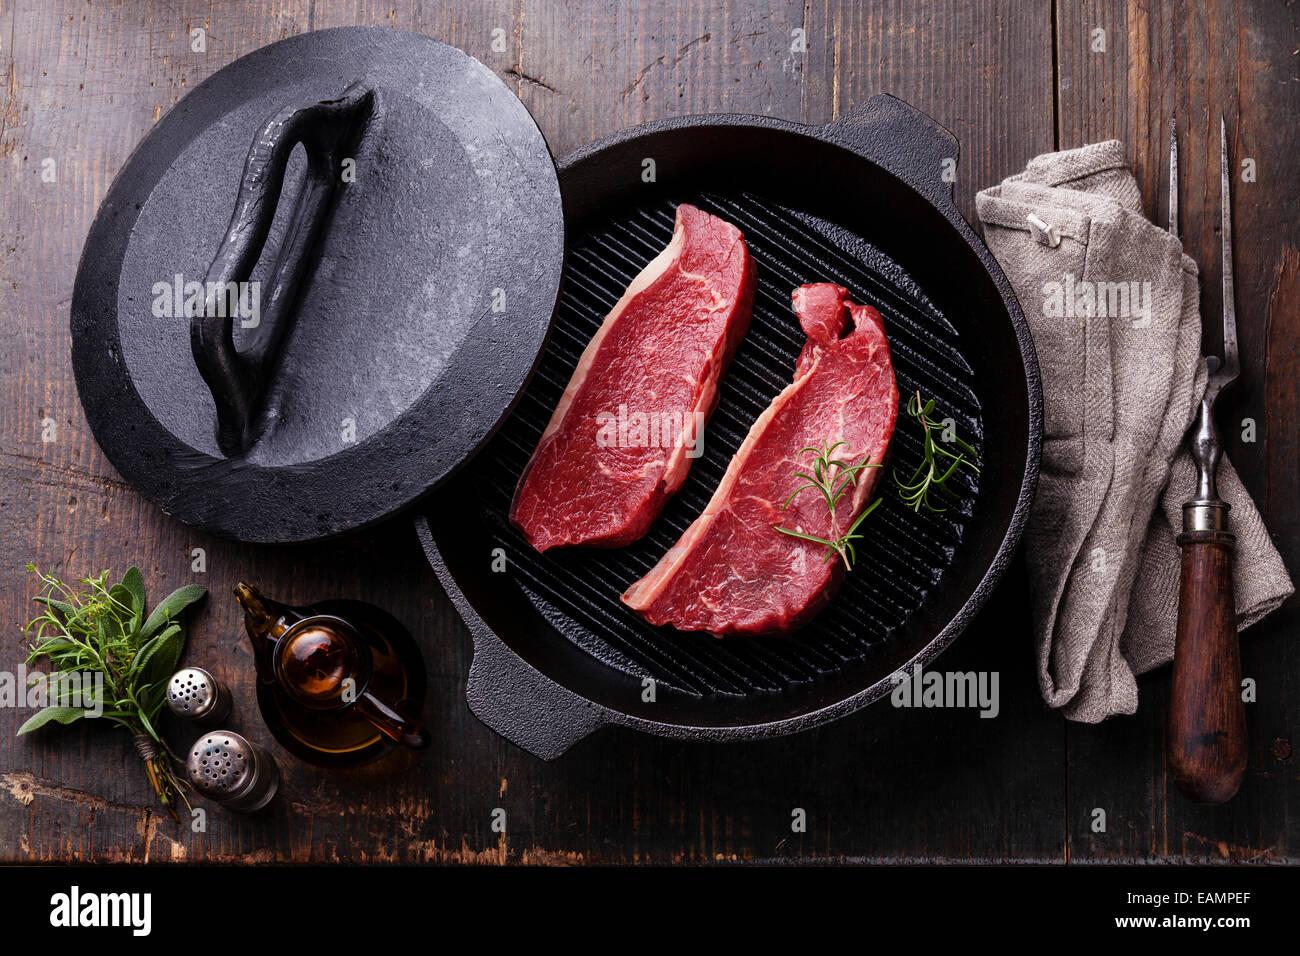 Rare Striploin steak on grill pan on wooden background - Stock Image